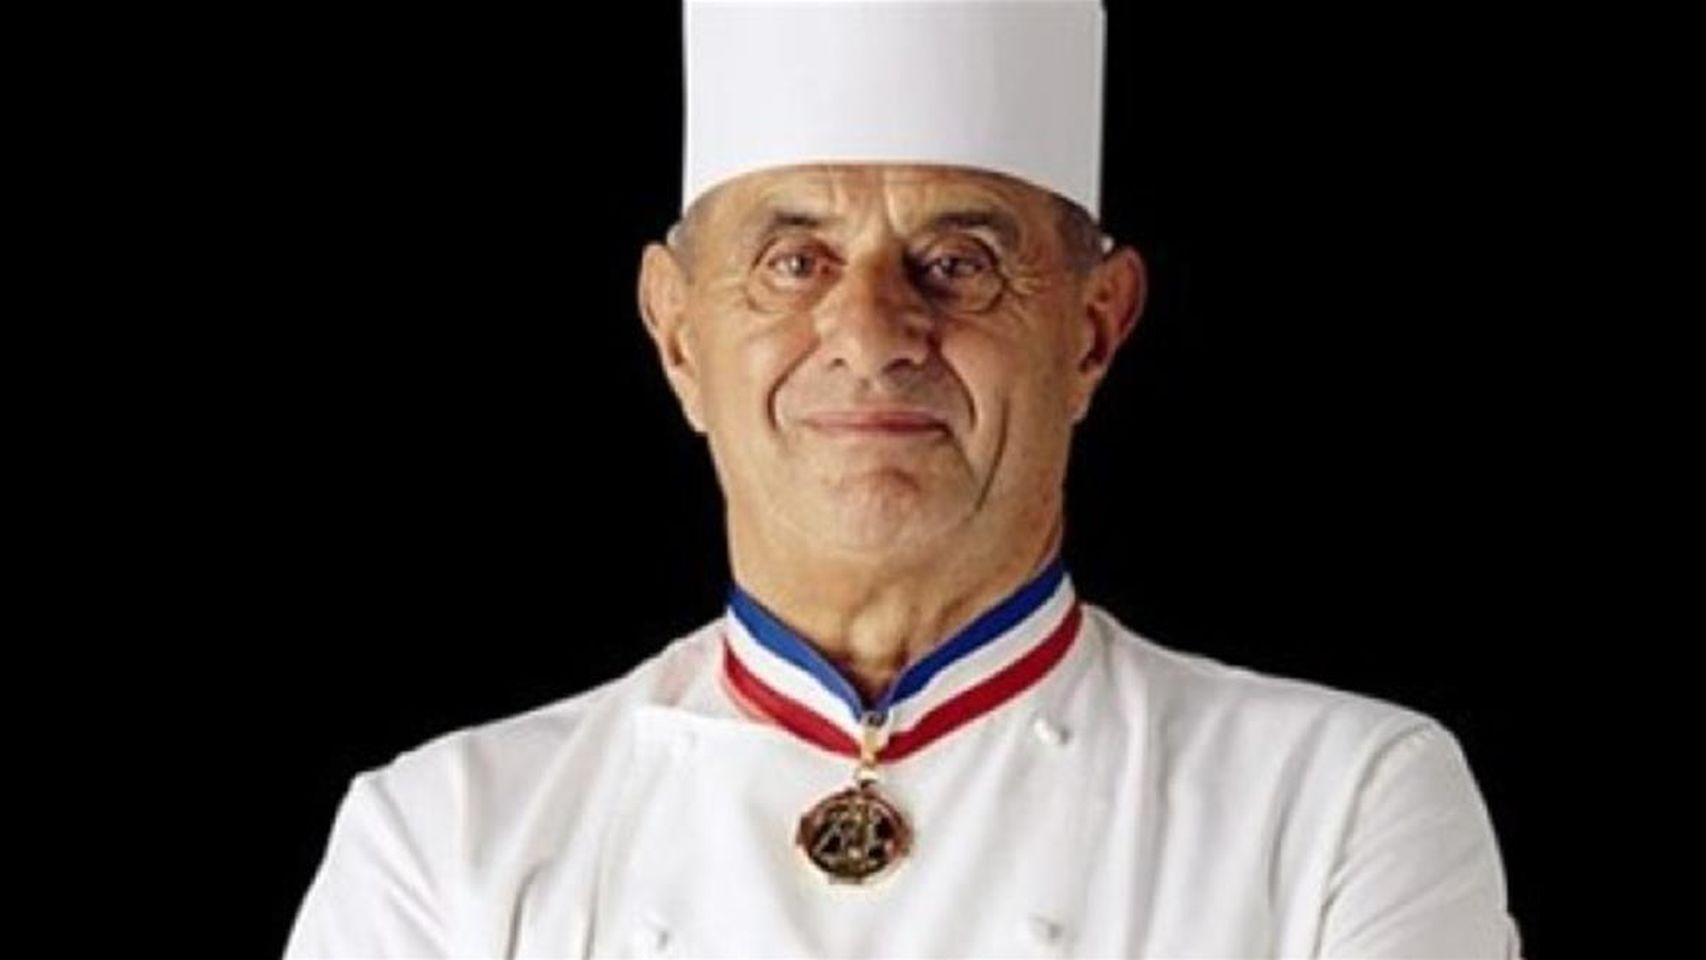 Muere Paul Bocuse, el ´Papa´ de la gastronomía e impulsor de la ´nouvelle cuisine´